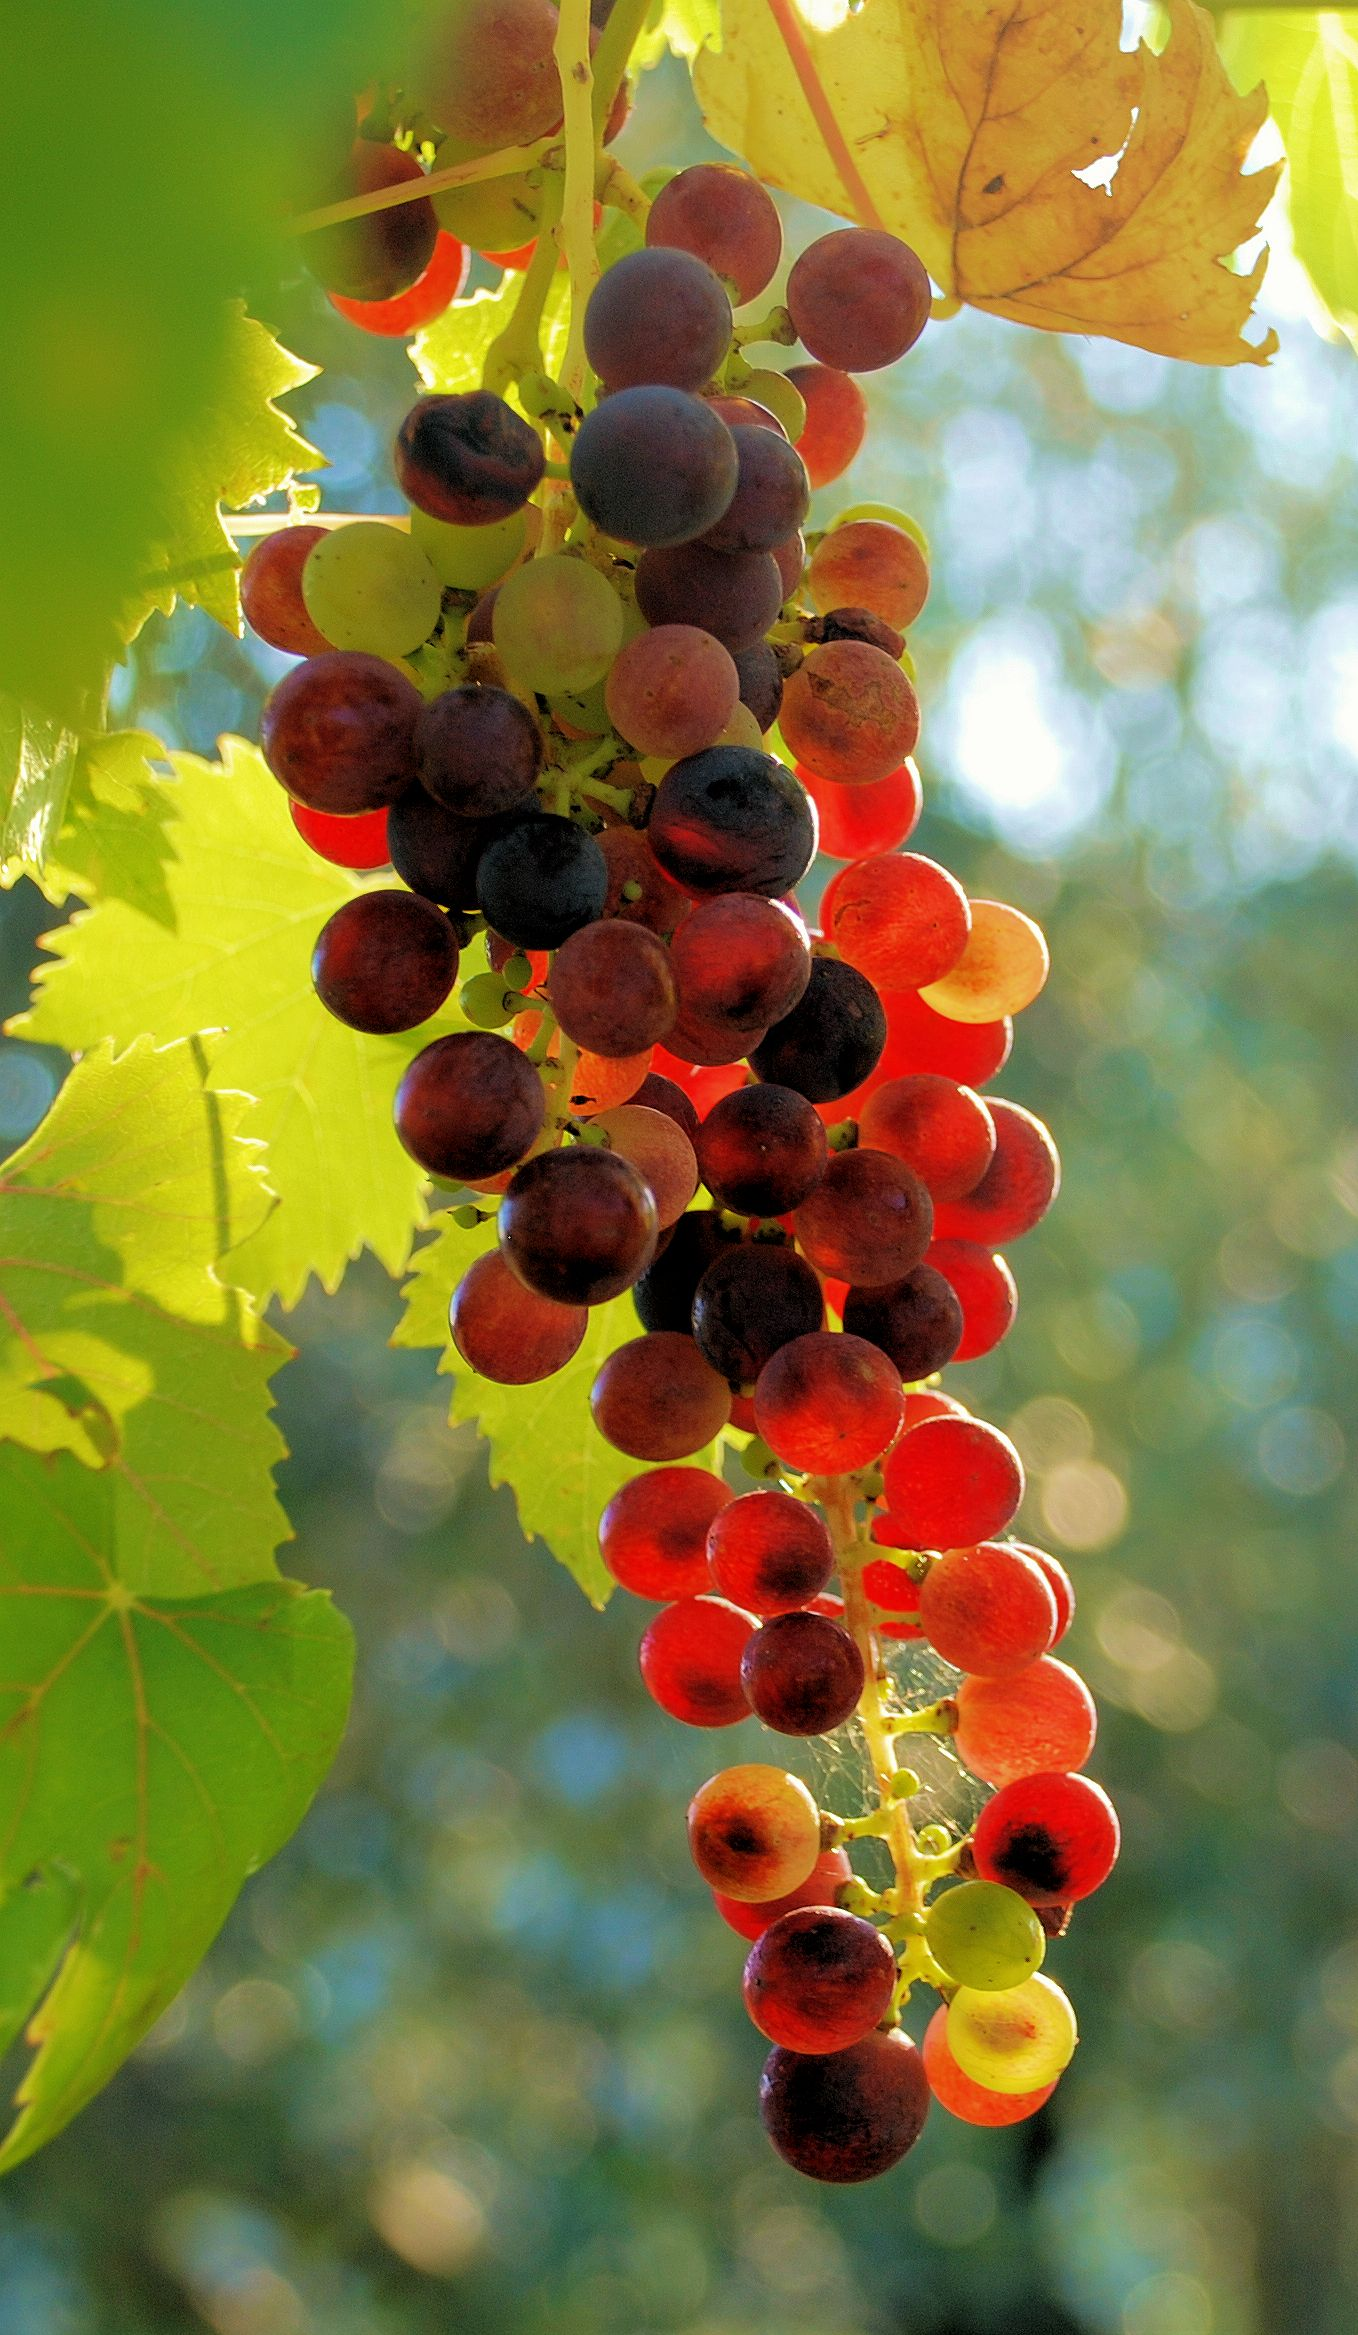 Bunch Of Jewels In 2020 Grapes Fruit Arrangements Grape Vines